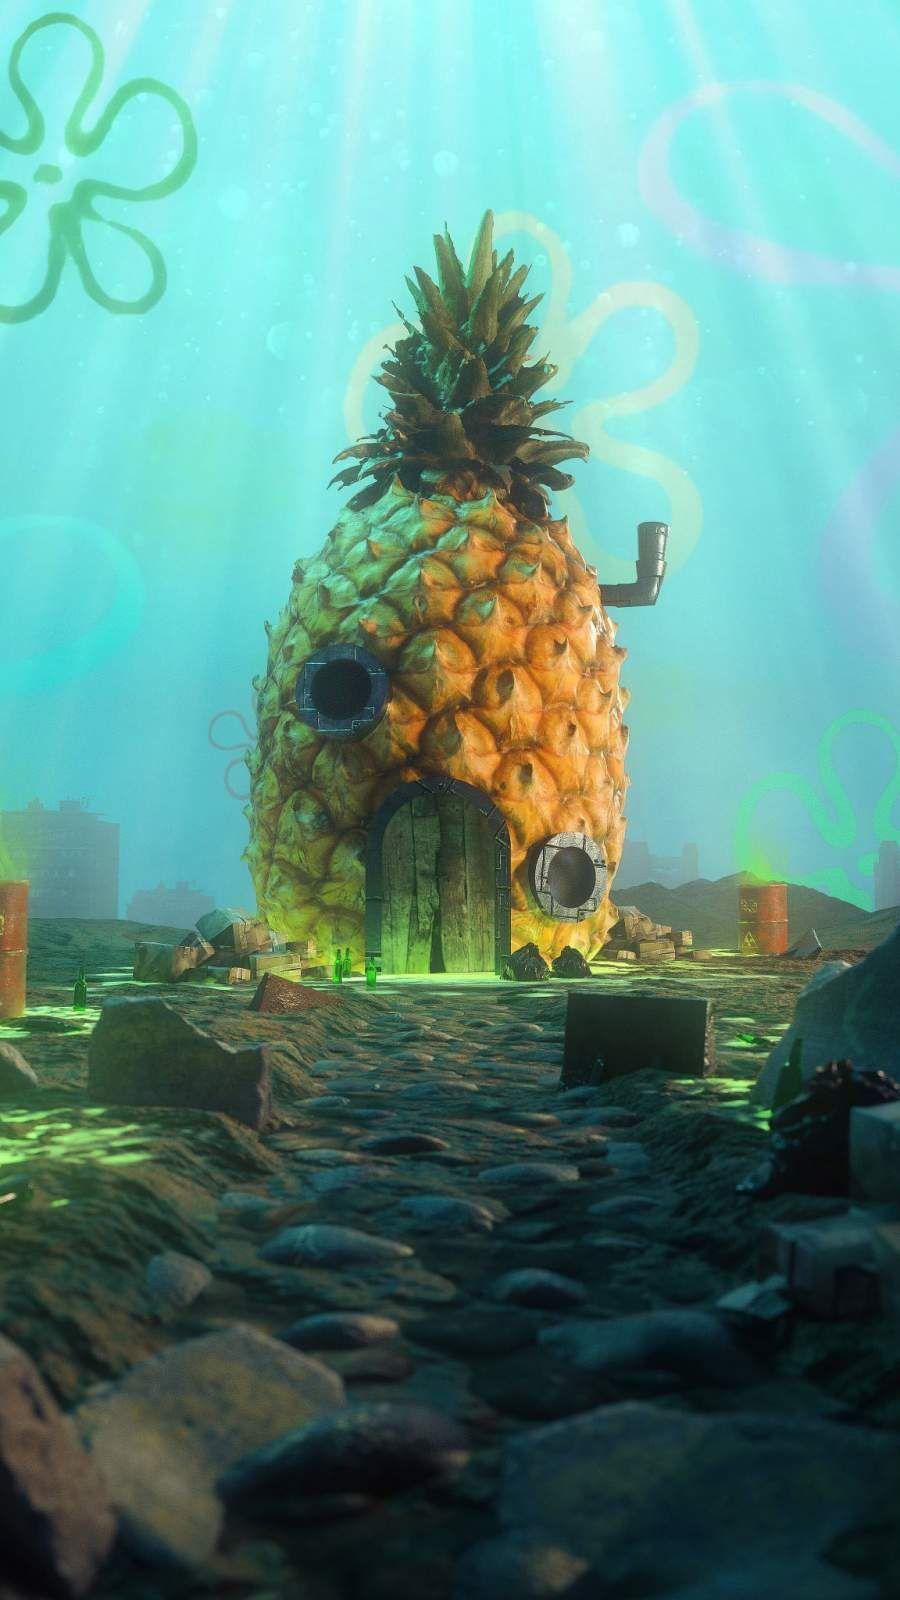 Spongebob Pineapple Wallpapers - Wallpaper Cave